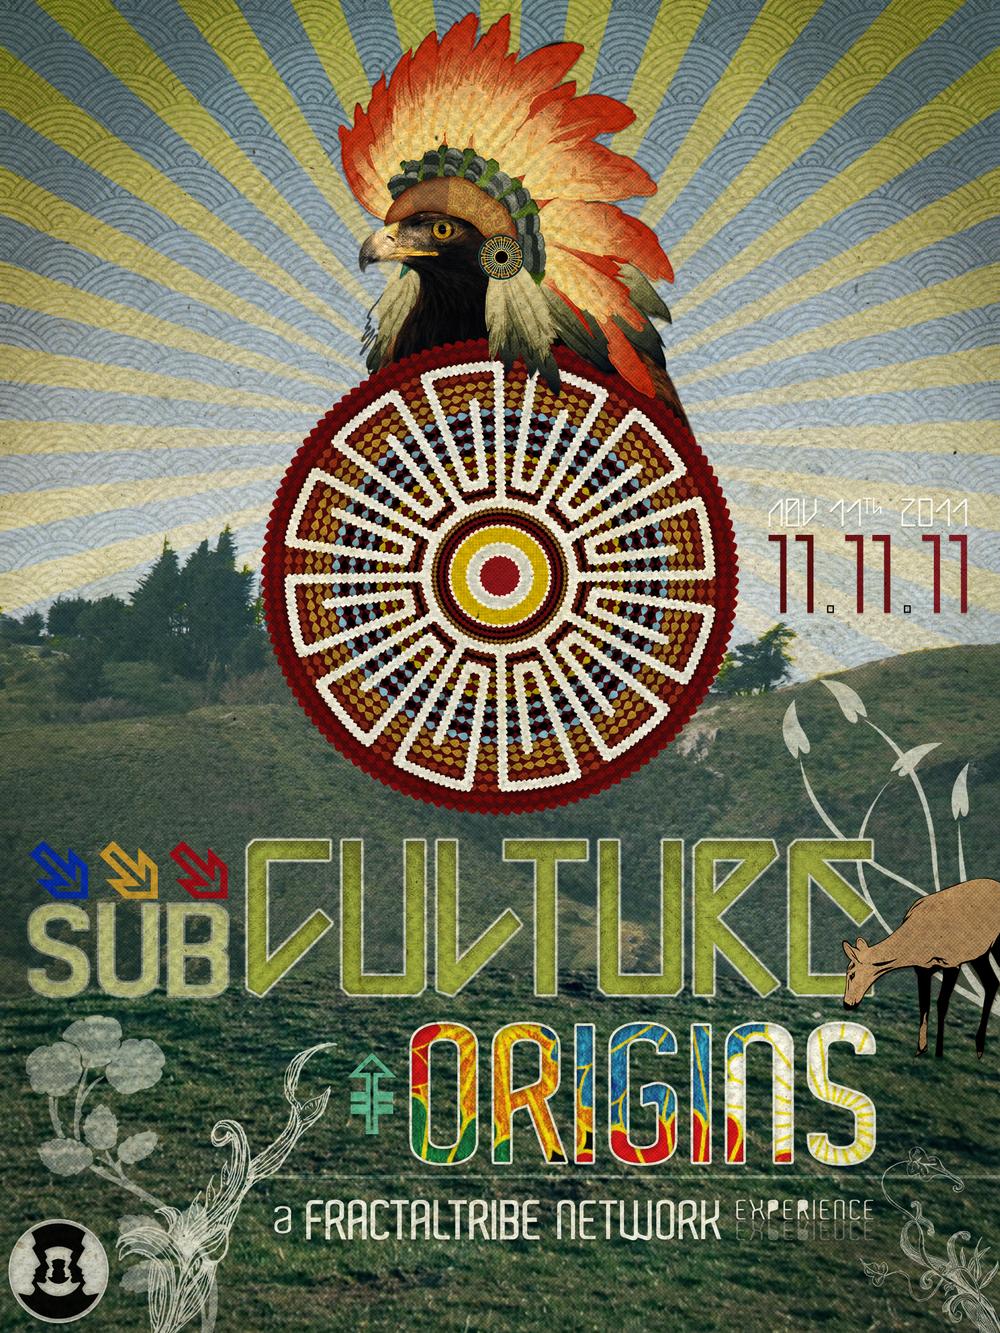 2011-11-11 Subculture Origins flyer front.jpg